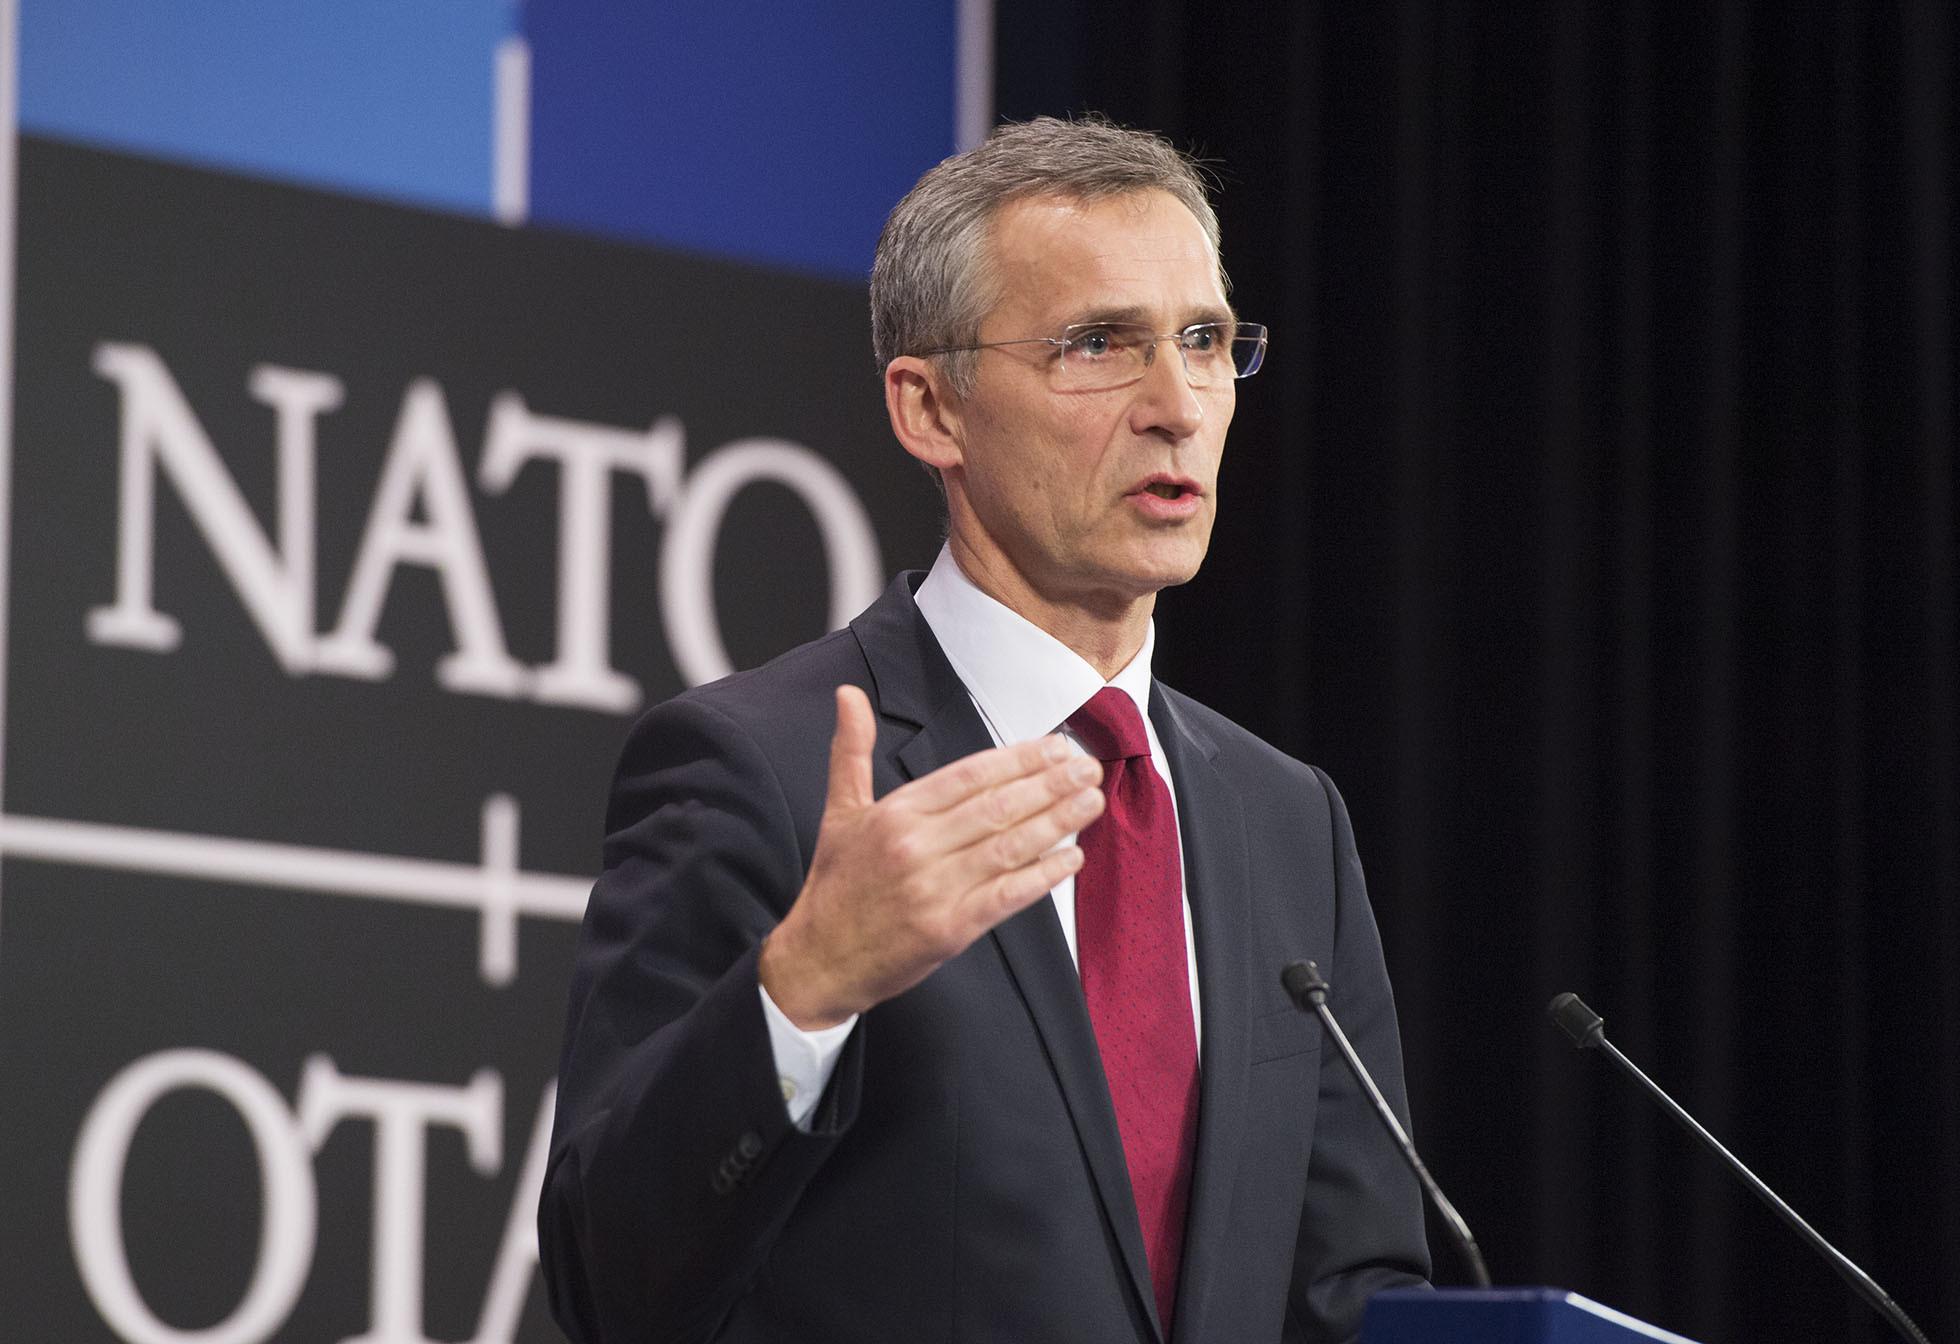 "<p>Йенс Столтенберг. Фото: &copy;Flickr/<a href=""https://www.flickr.com/photos/nato/"" title=""Go to NATO North Atlantic Treaty Organization's photostream"" data-track=""attributionNameClick"">NATO North Atlantic Treaty Organization</a></p>"